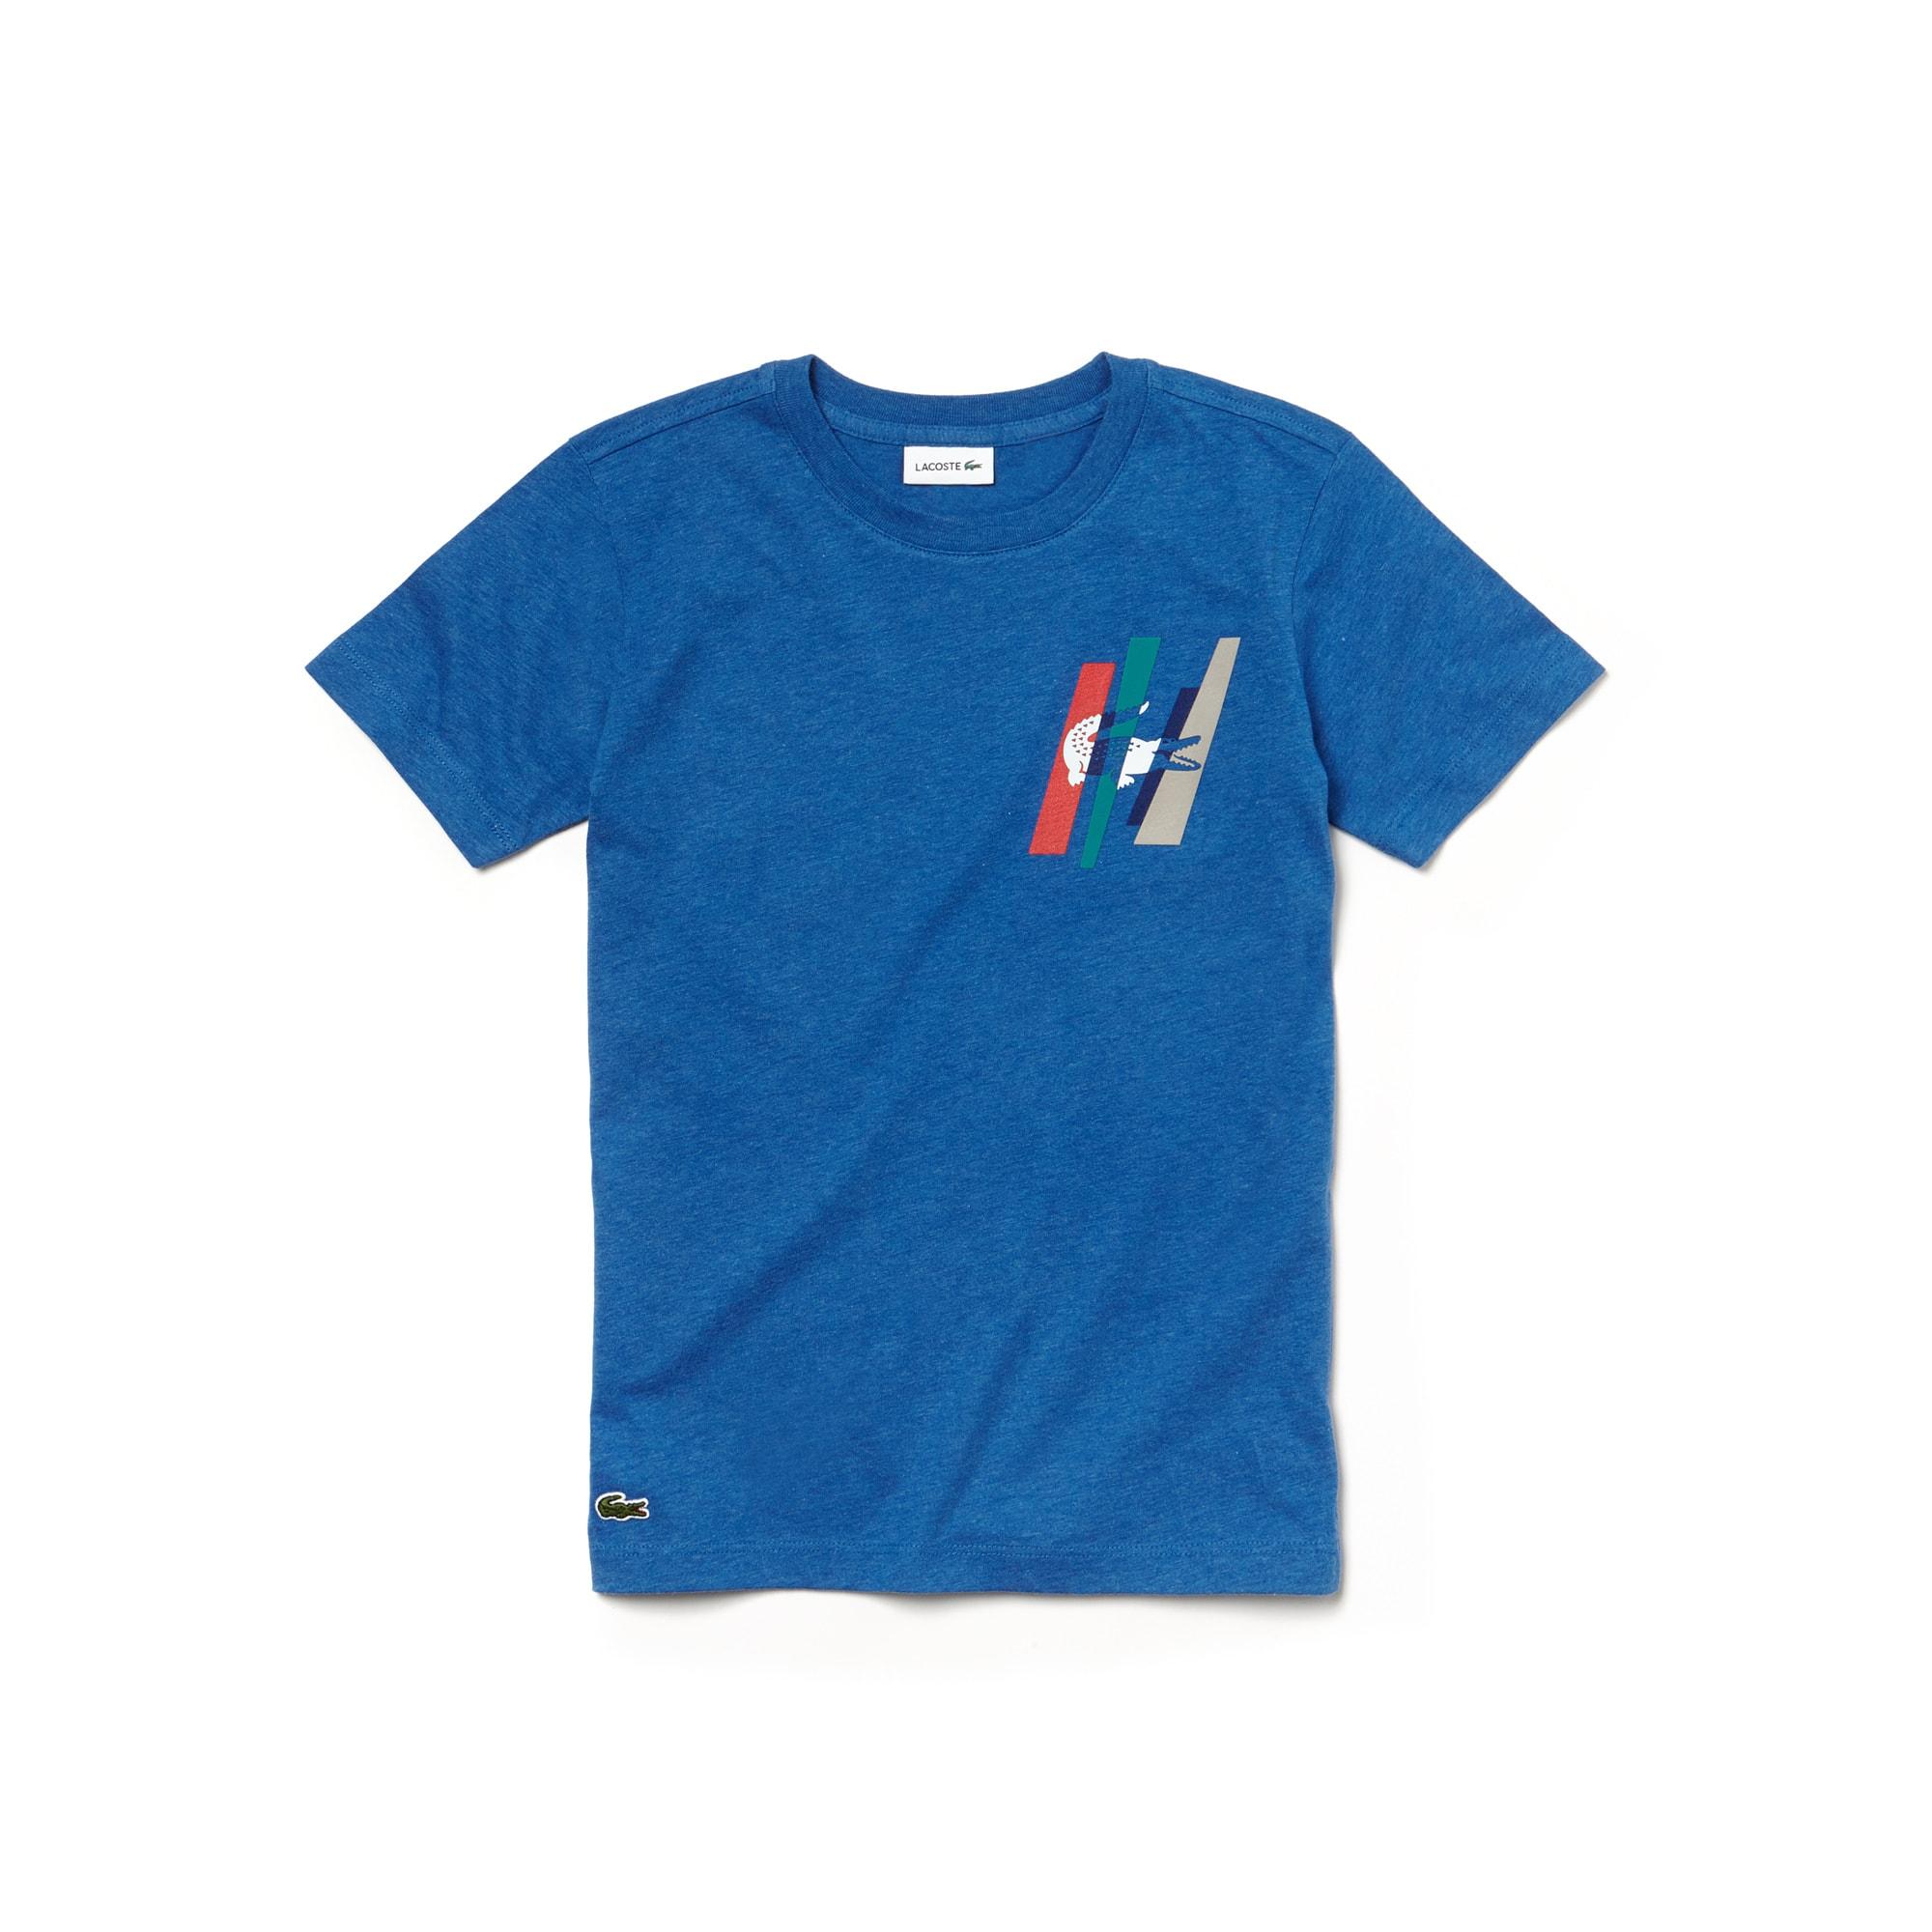 Boys' Crew Neck Crocodile Design Jersey T-shirt